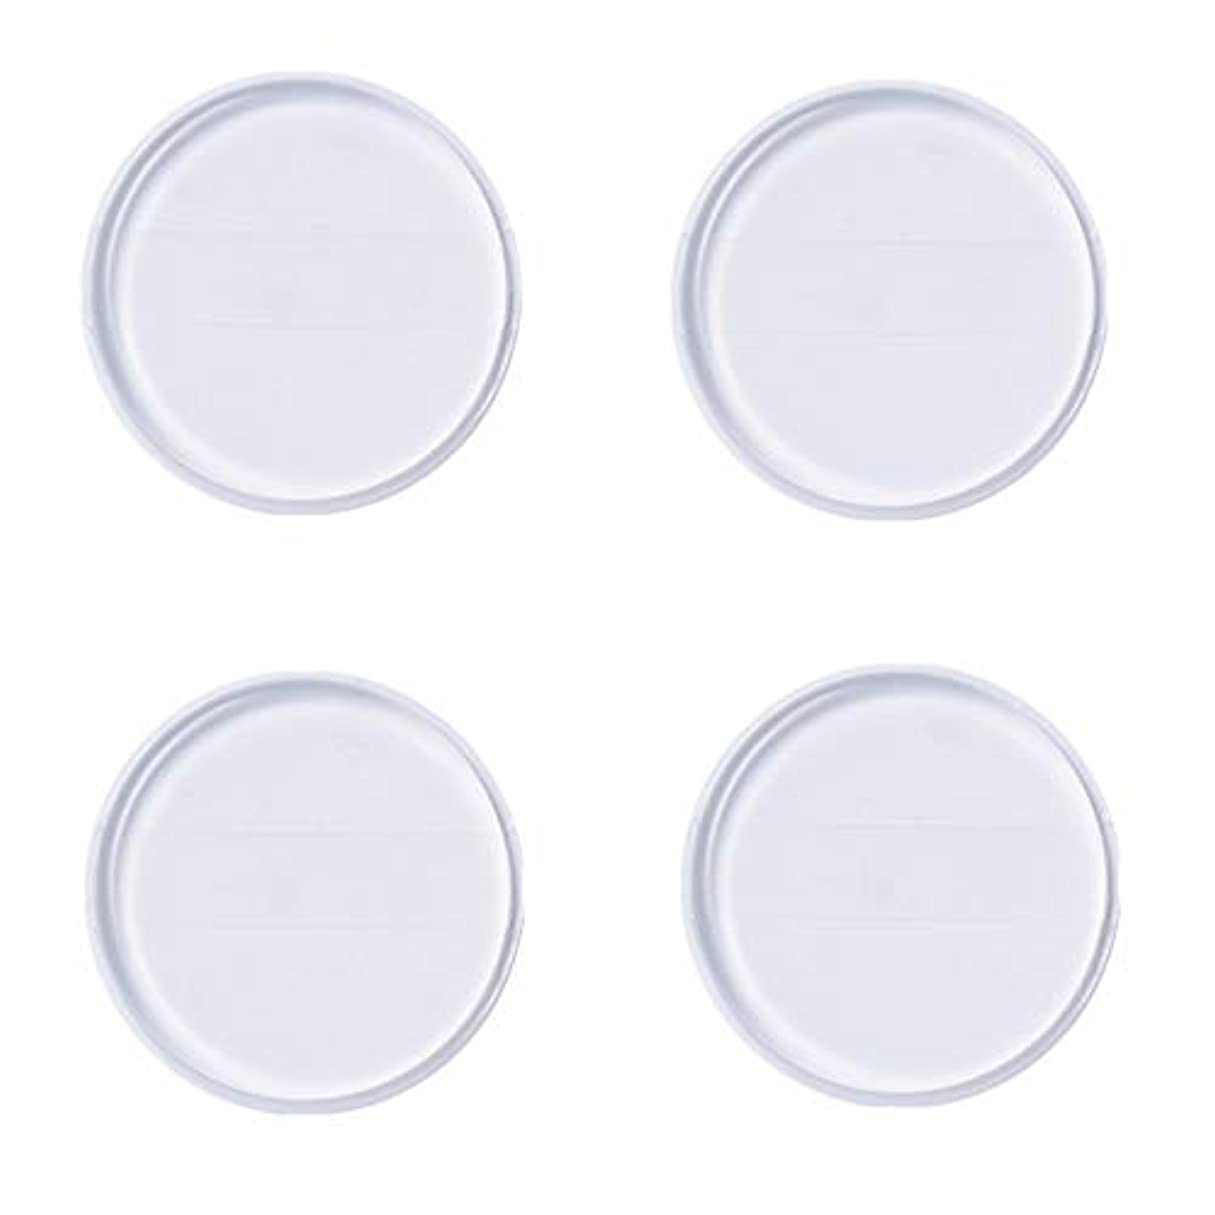 Kingsie シリコンパフ 帯付き 4個セット 丸型 透明 柔らかい ファンデーションパフ ゲルパフ メイクスポンジ 水洗い 清潔